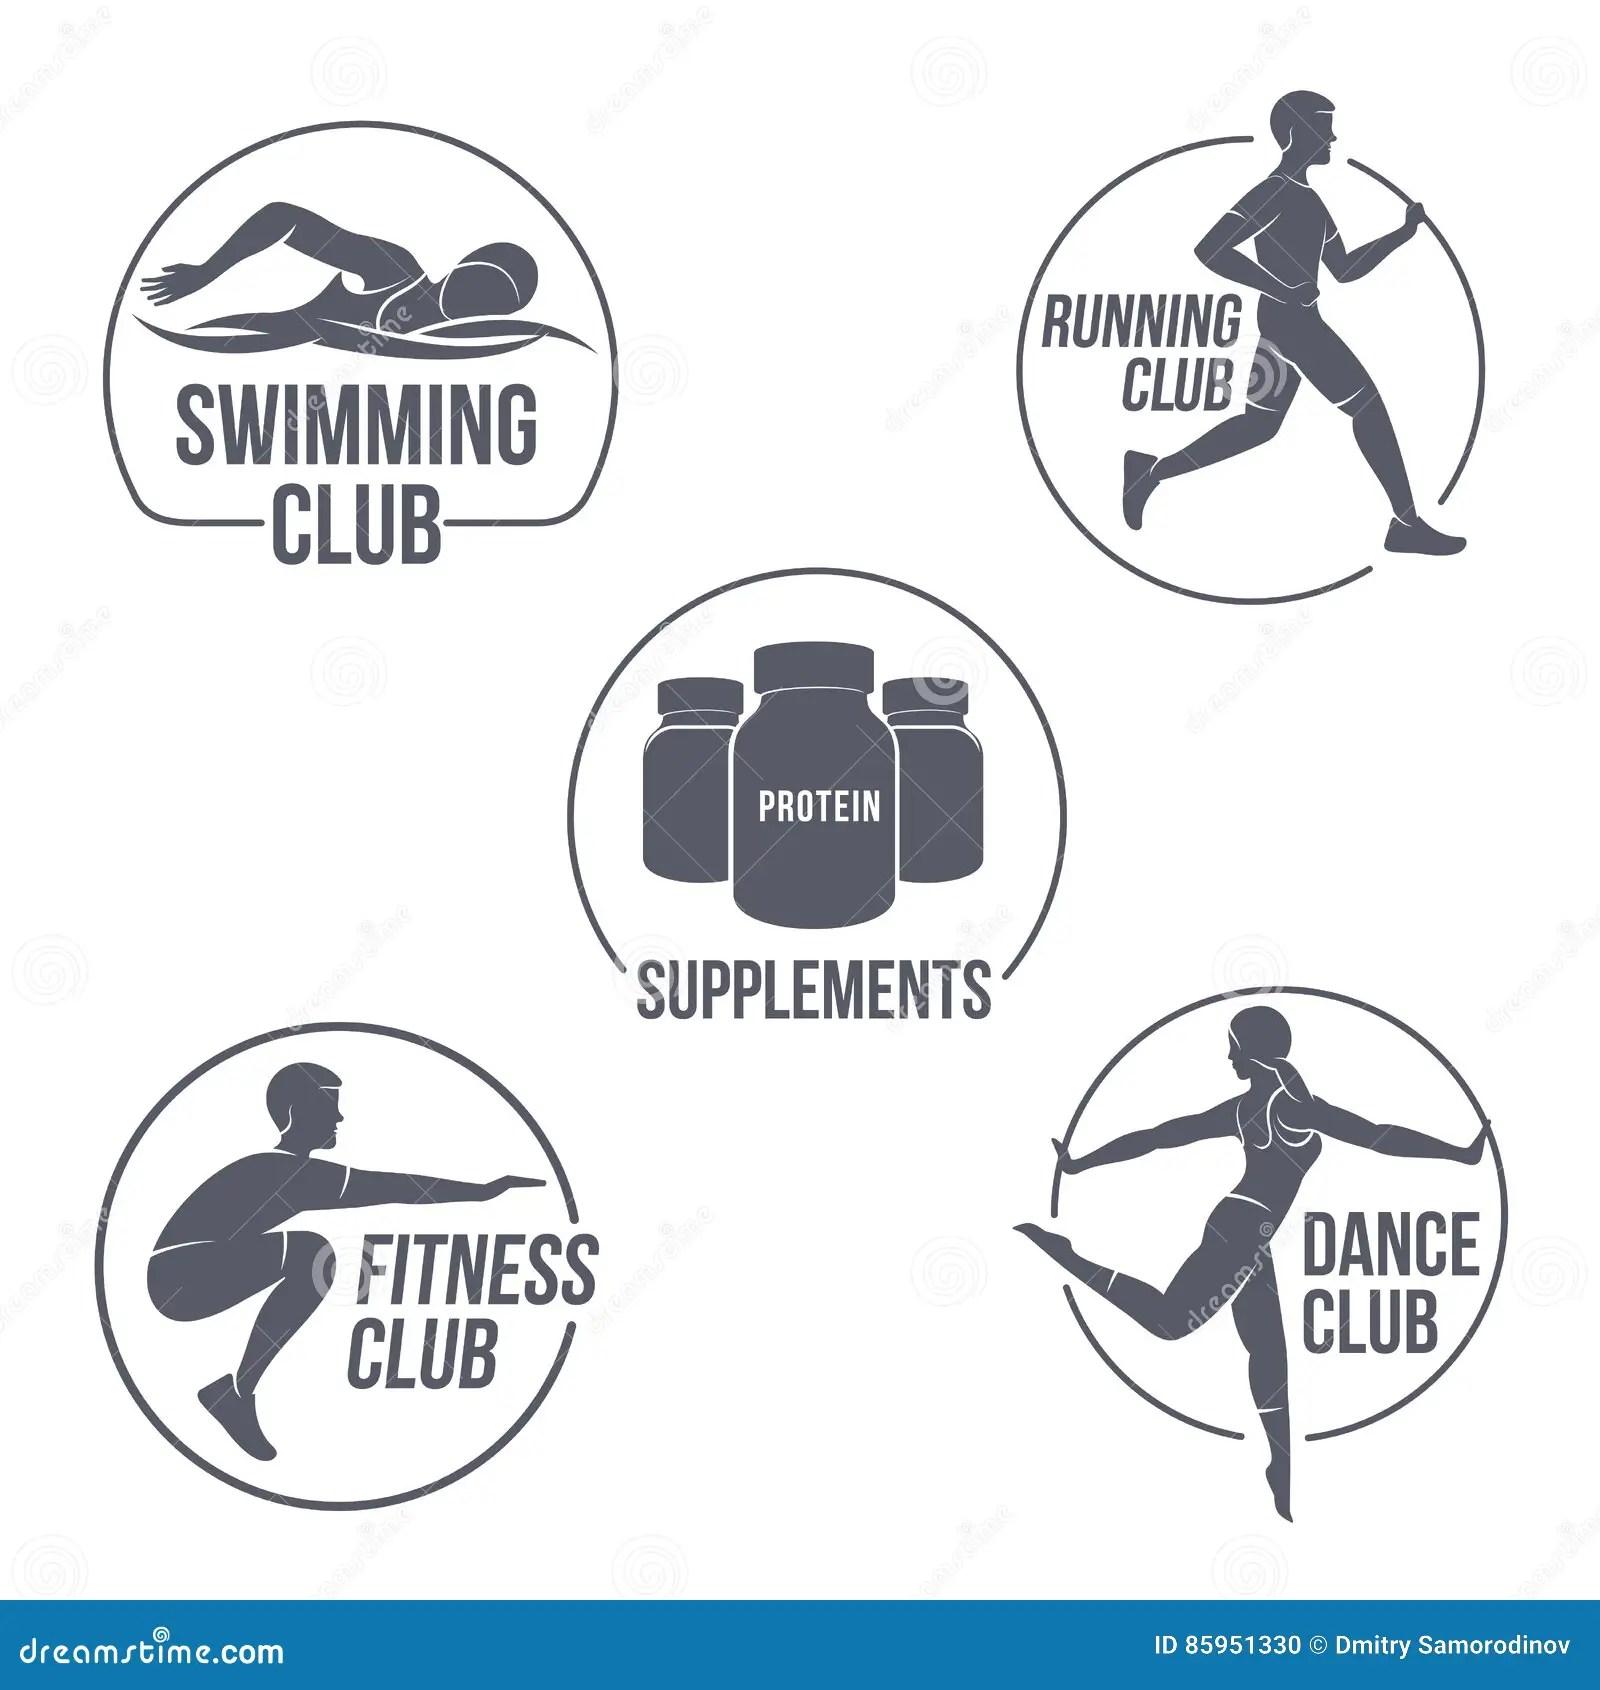 Aerobic workout logo stock illustration. Illustration of